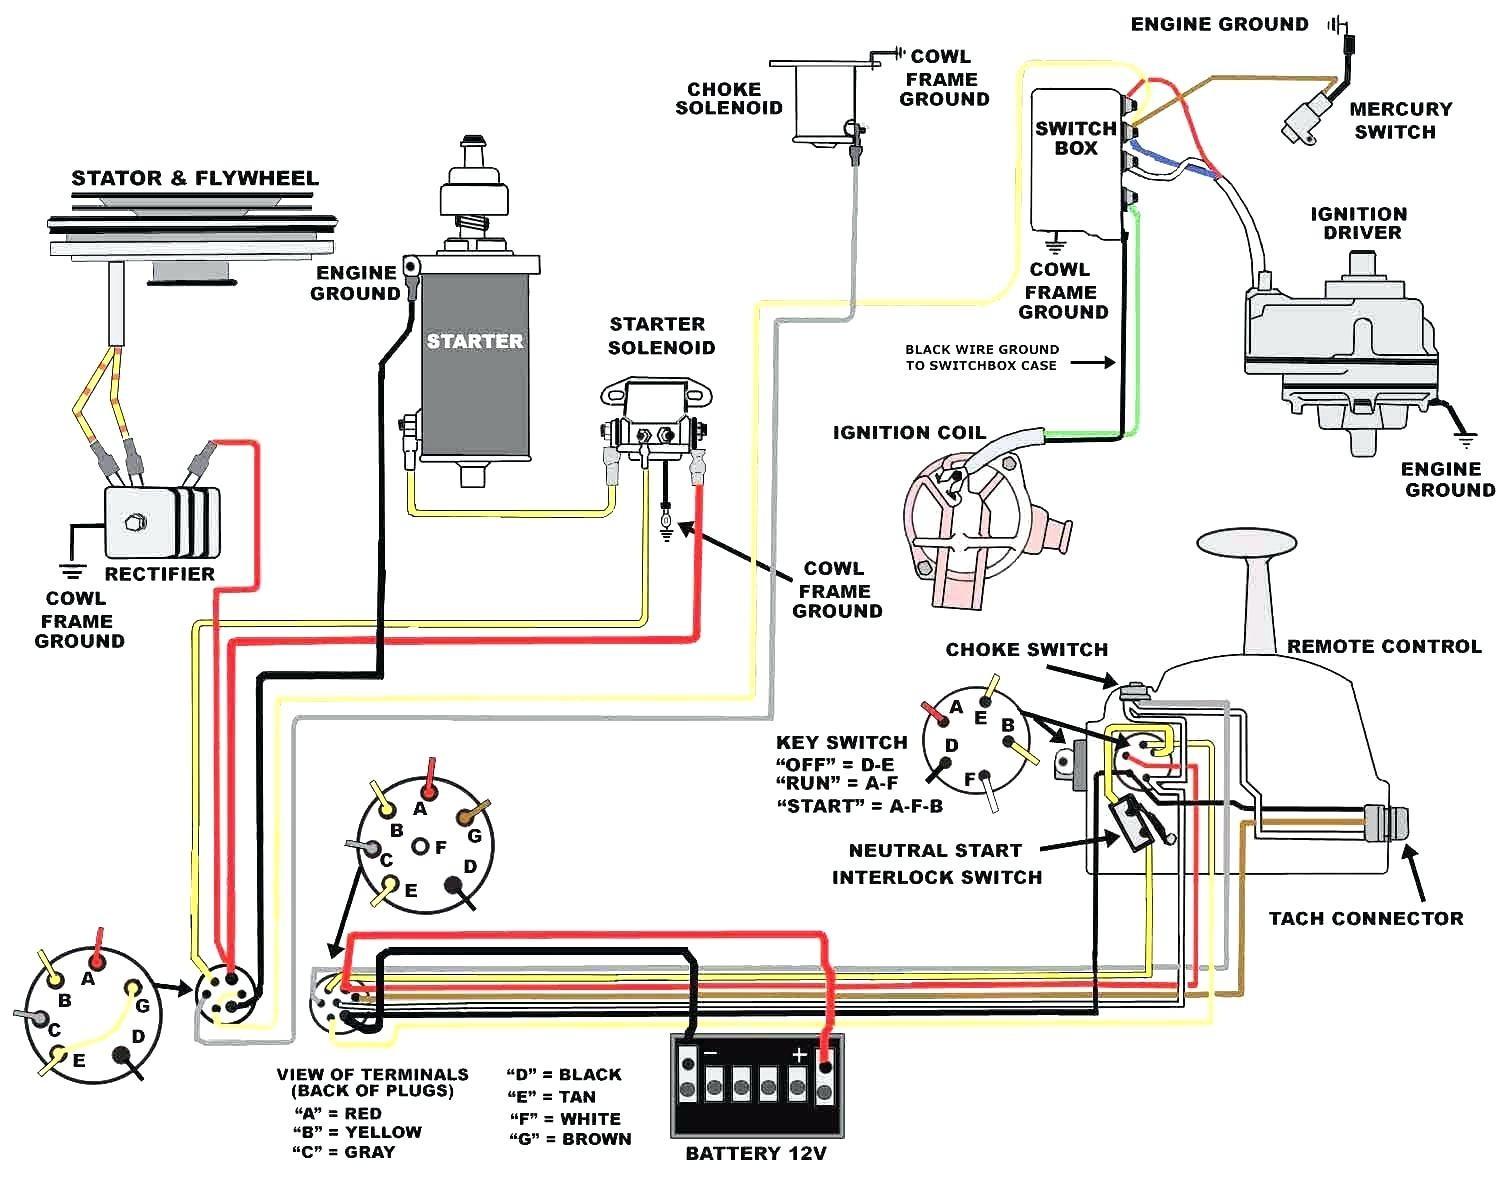 Random Ignition Switch Wiring Diagram - Panoramabypatysesma - Ignition Switch Wiring Diagram